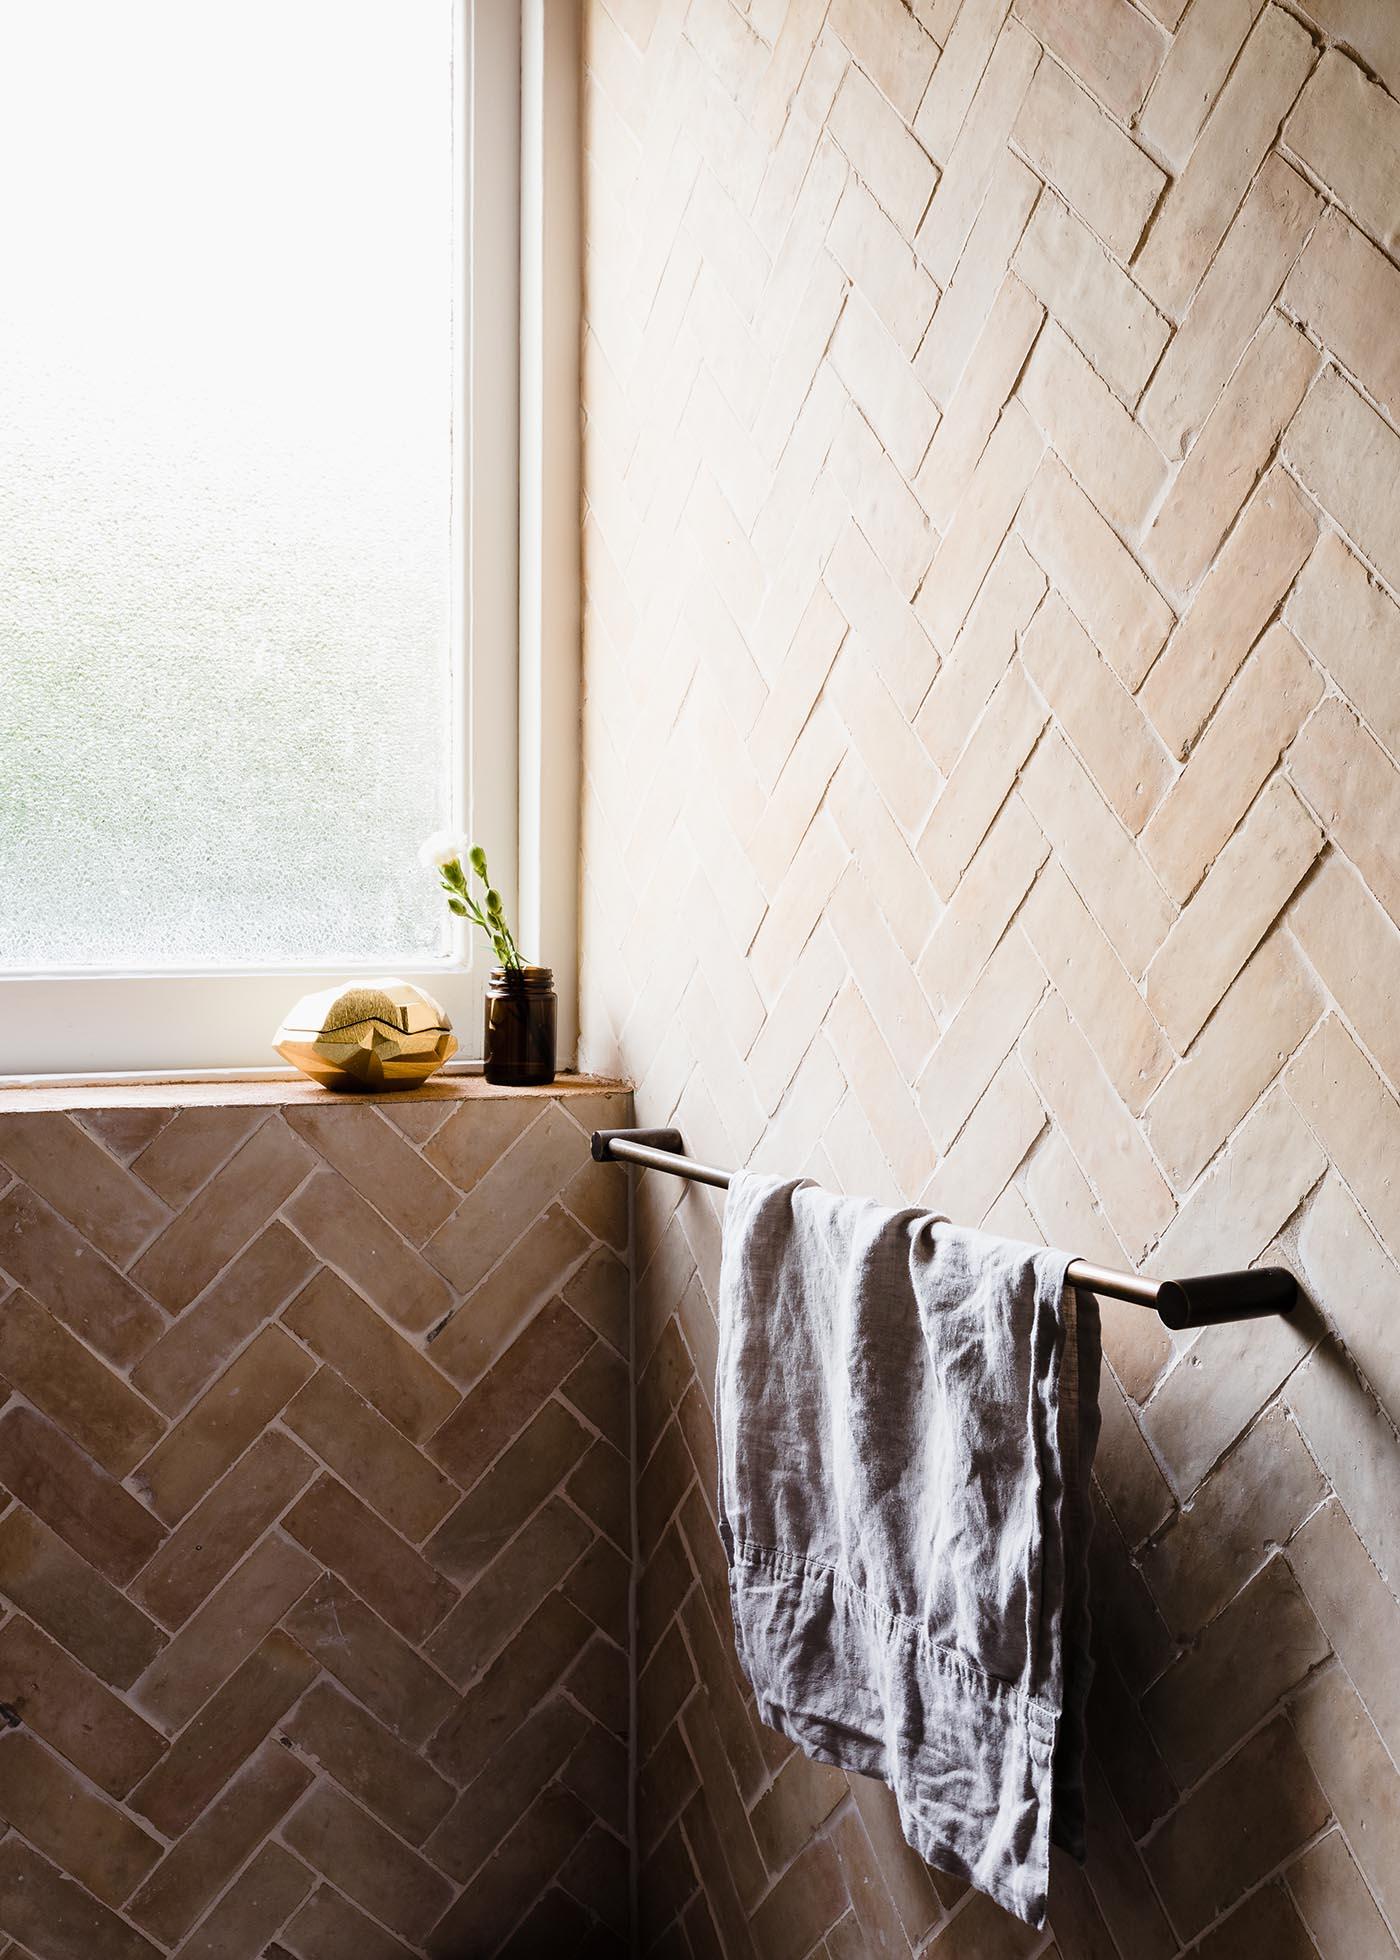 GABBE INTERIOR TILESOFEZRA Georgia Ezra Home Feature shower Mosaic Moroccan Bejmat feature Bathroom tile.jpg